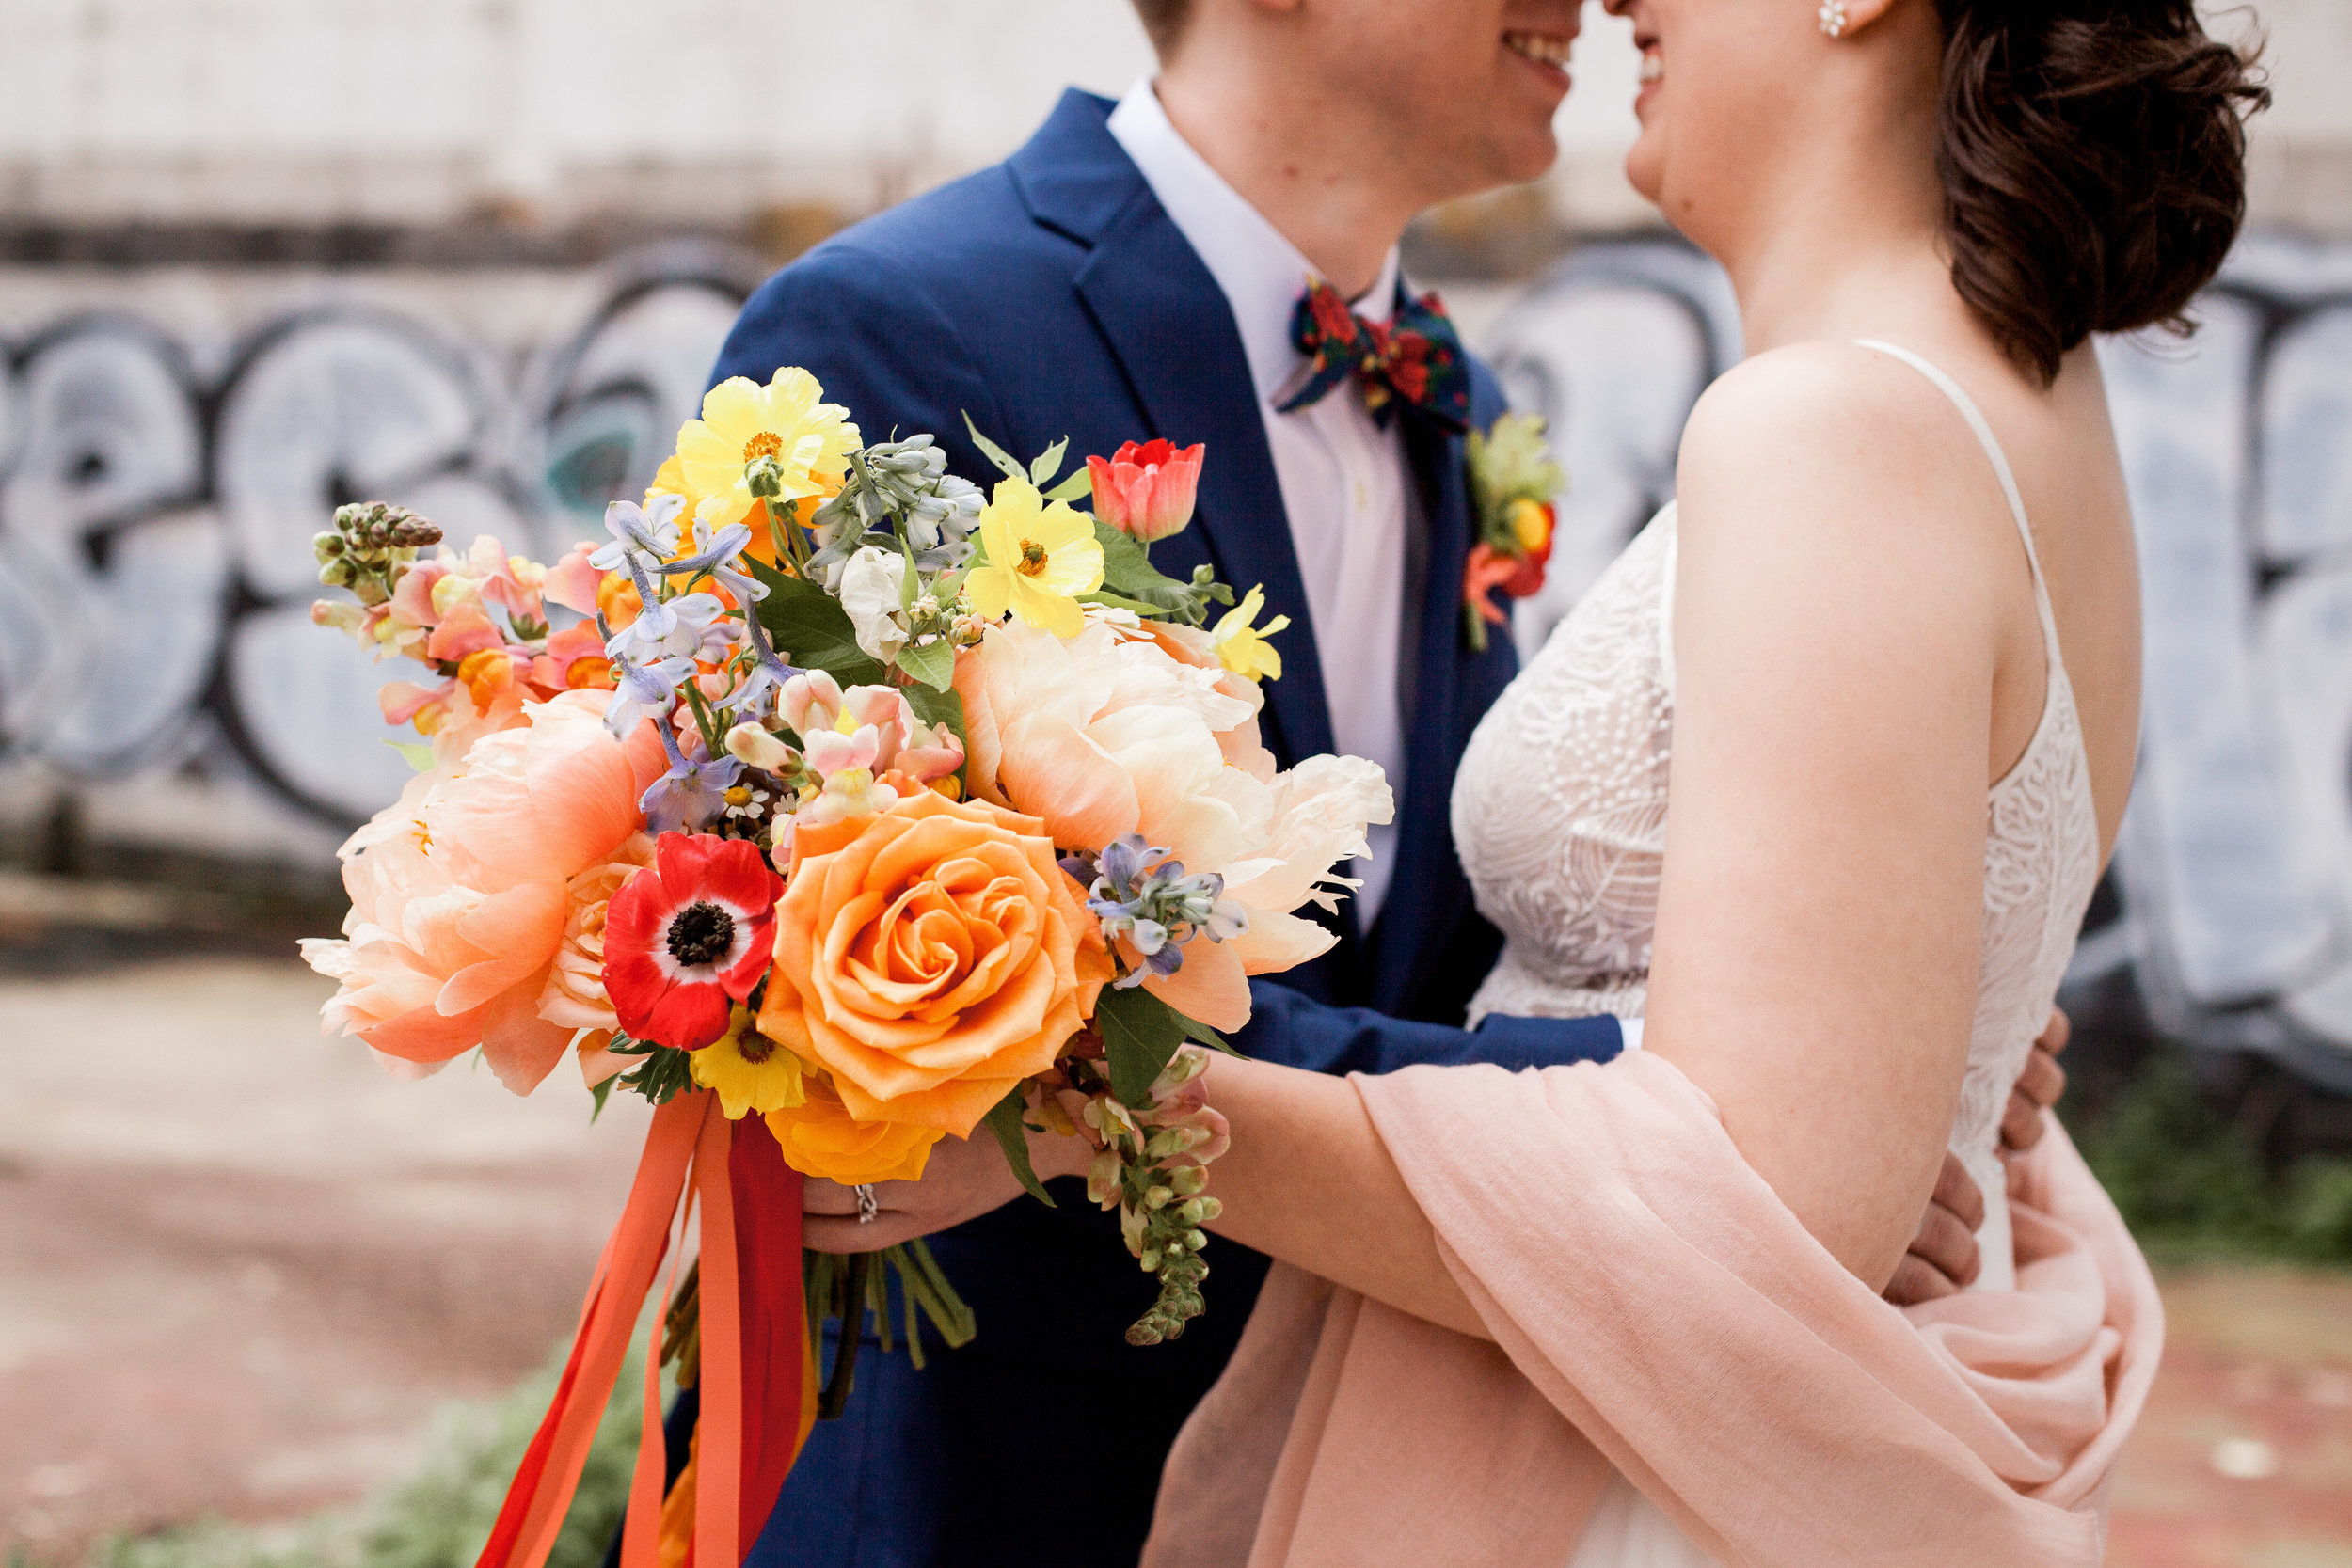 pittsburgh_wedding_photographer_liz_capuano-0597.jpg